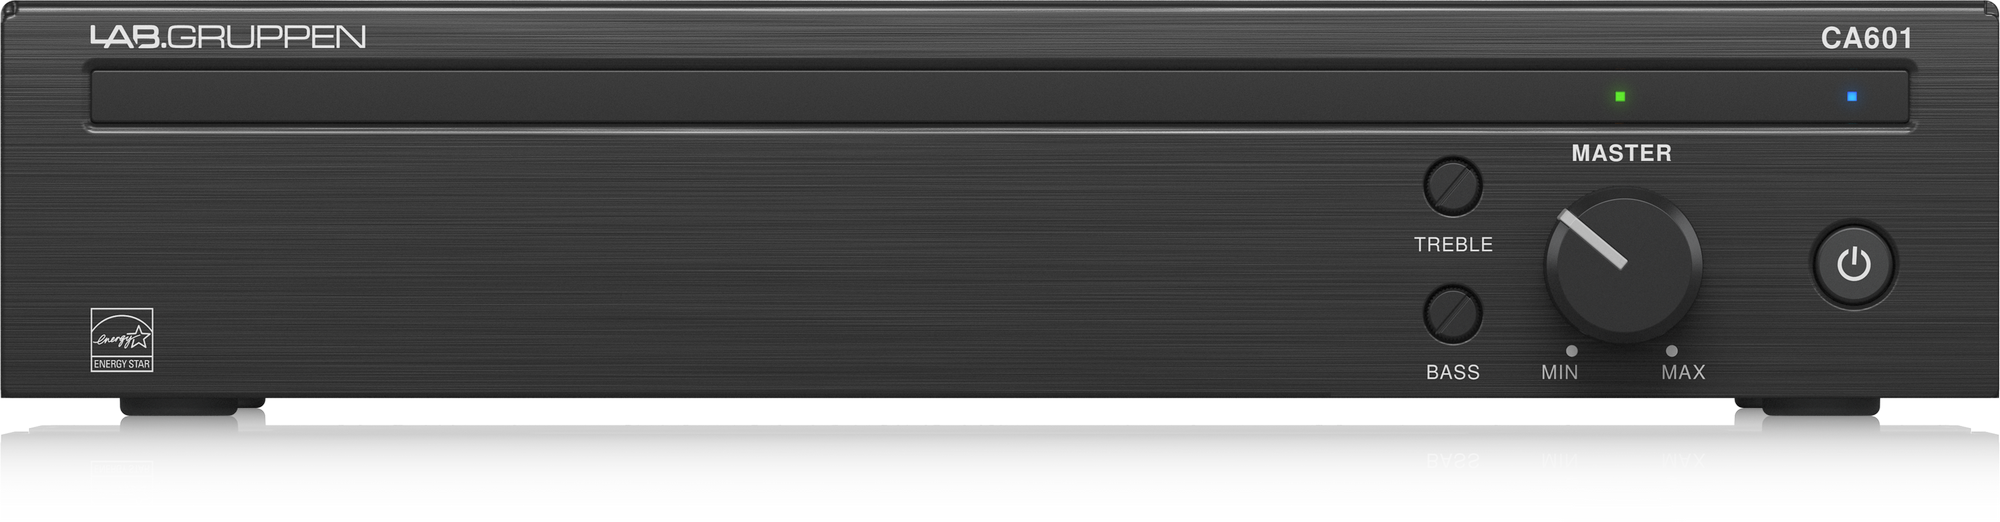 Lab Gruppen CA601 - Leistungsverstärker